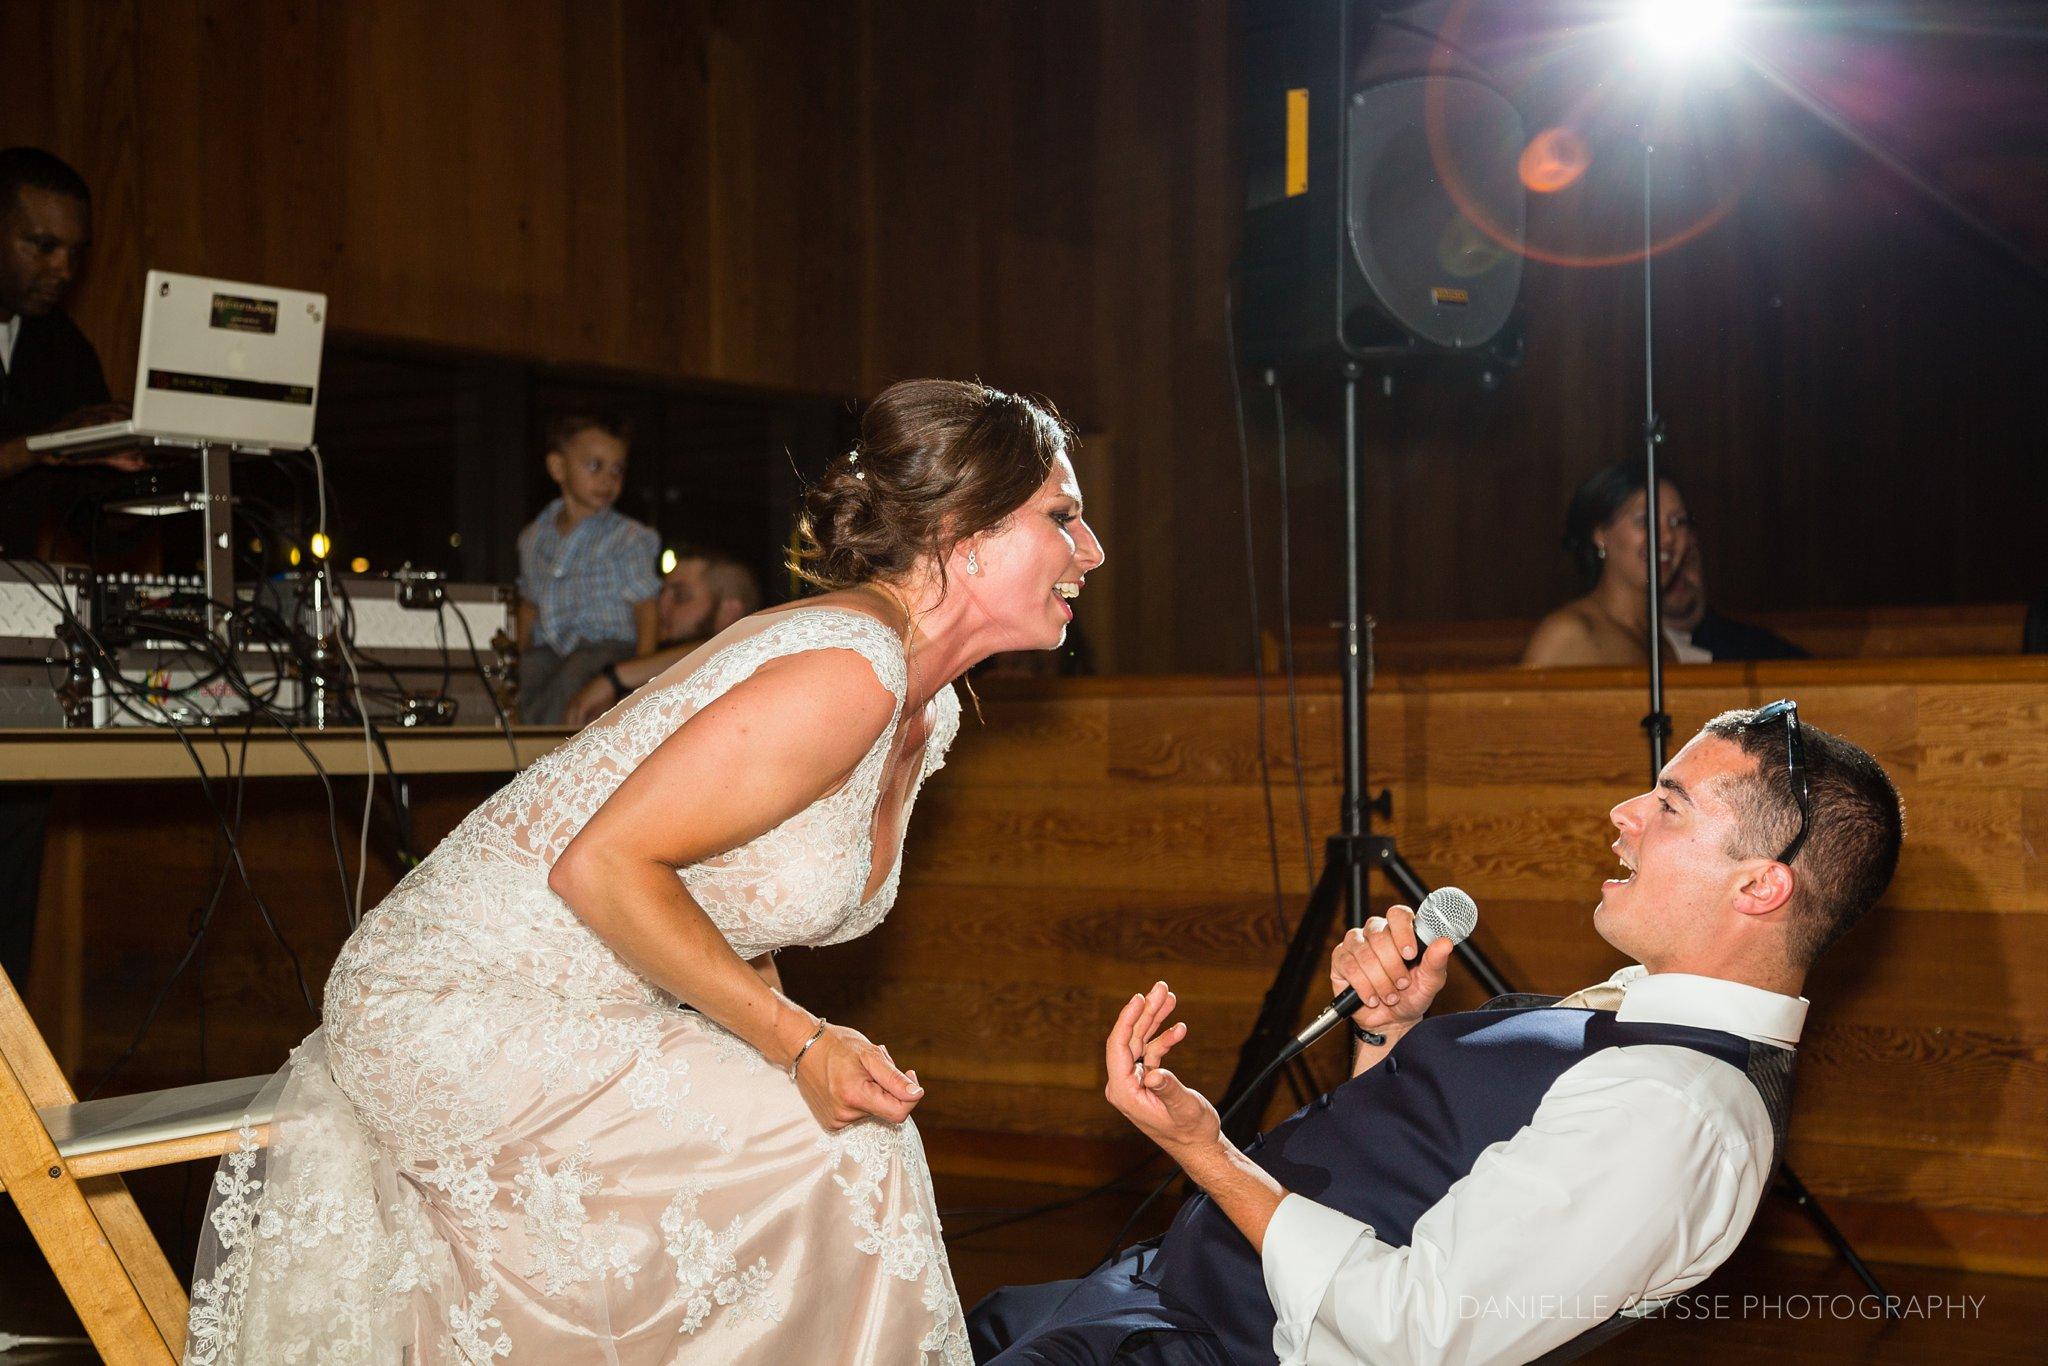 170429_blog_kimberly_ben_wedding_san_mateo_curiodyssey_danielle_alysse_photography_sacramento_photographer0839_WEB.jpg